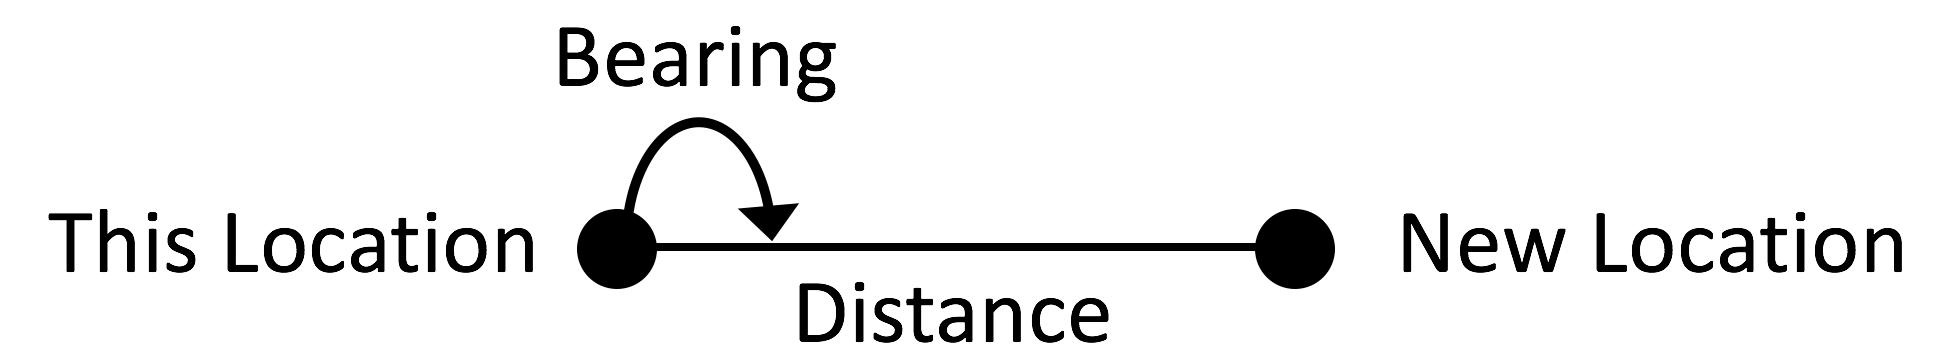 BearingDistance